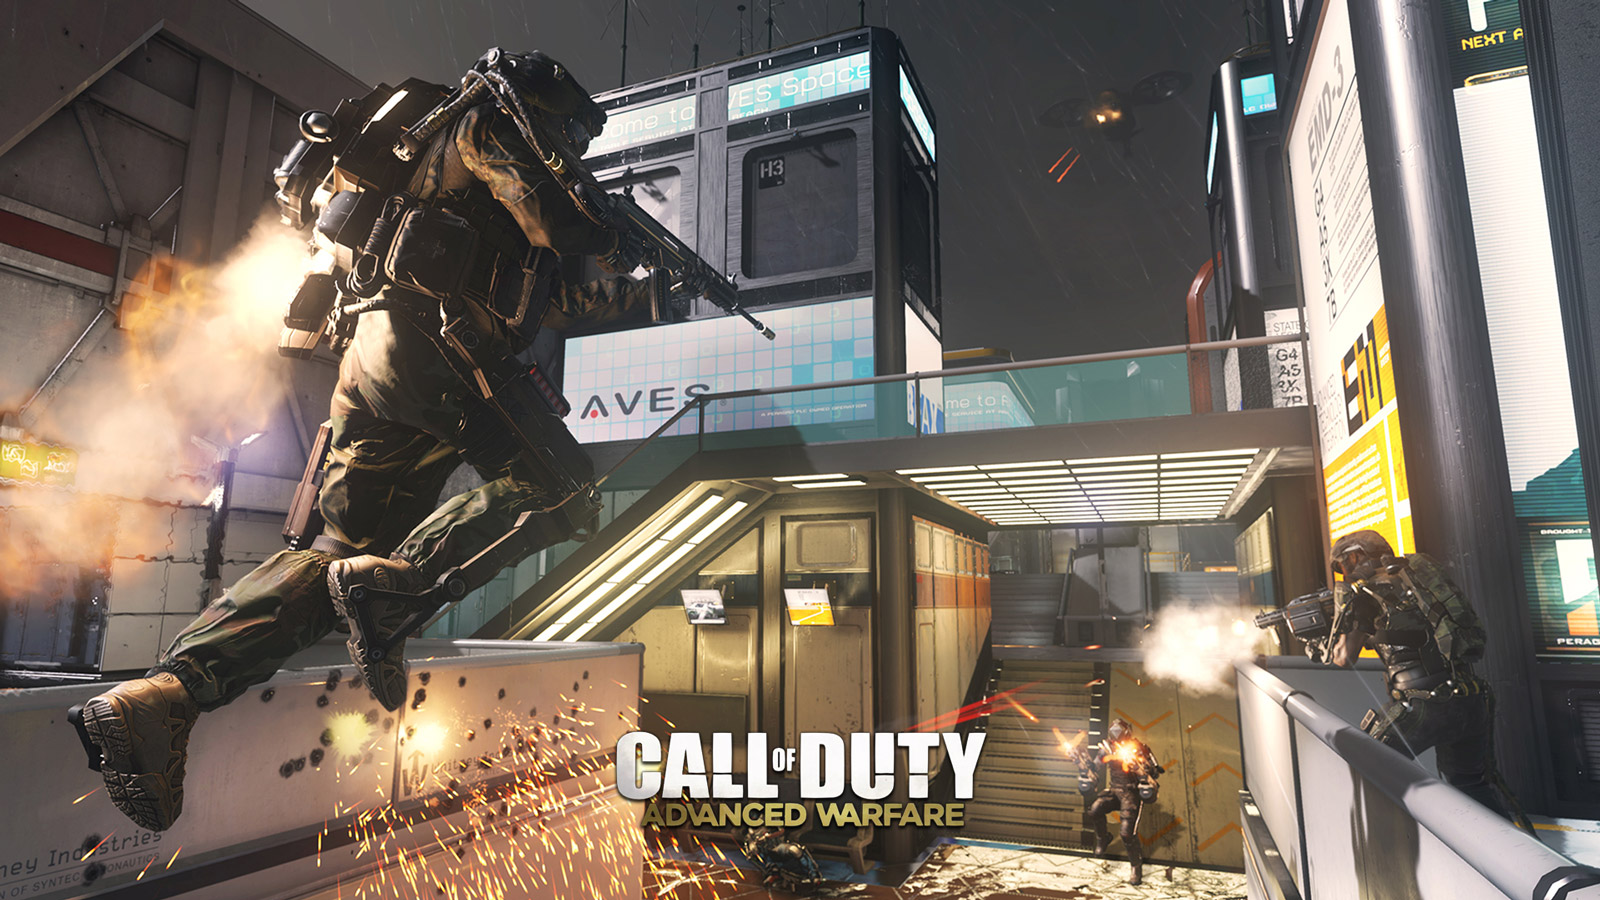 Free Call of Duty: Advanced Warfare Wallpaper in 1600x900